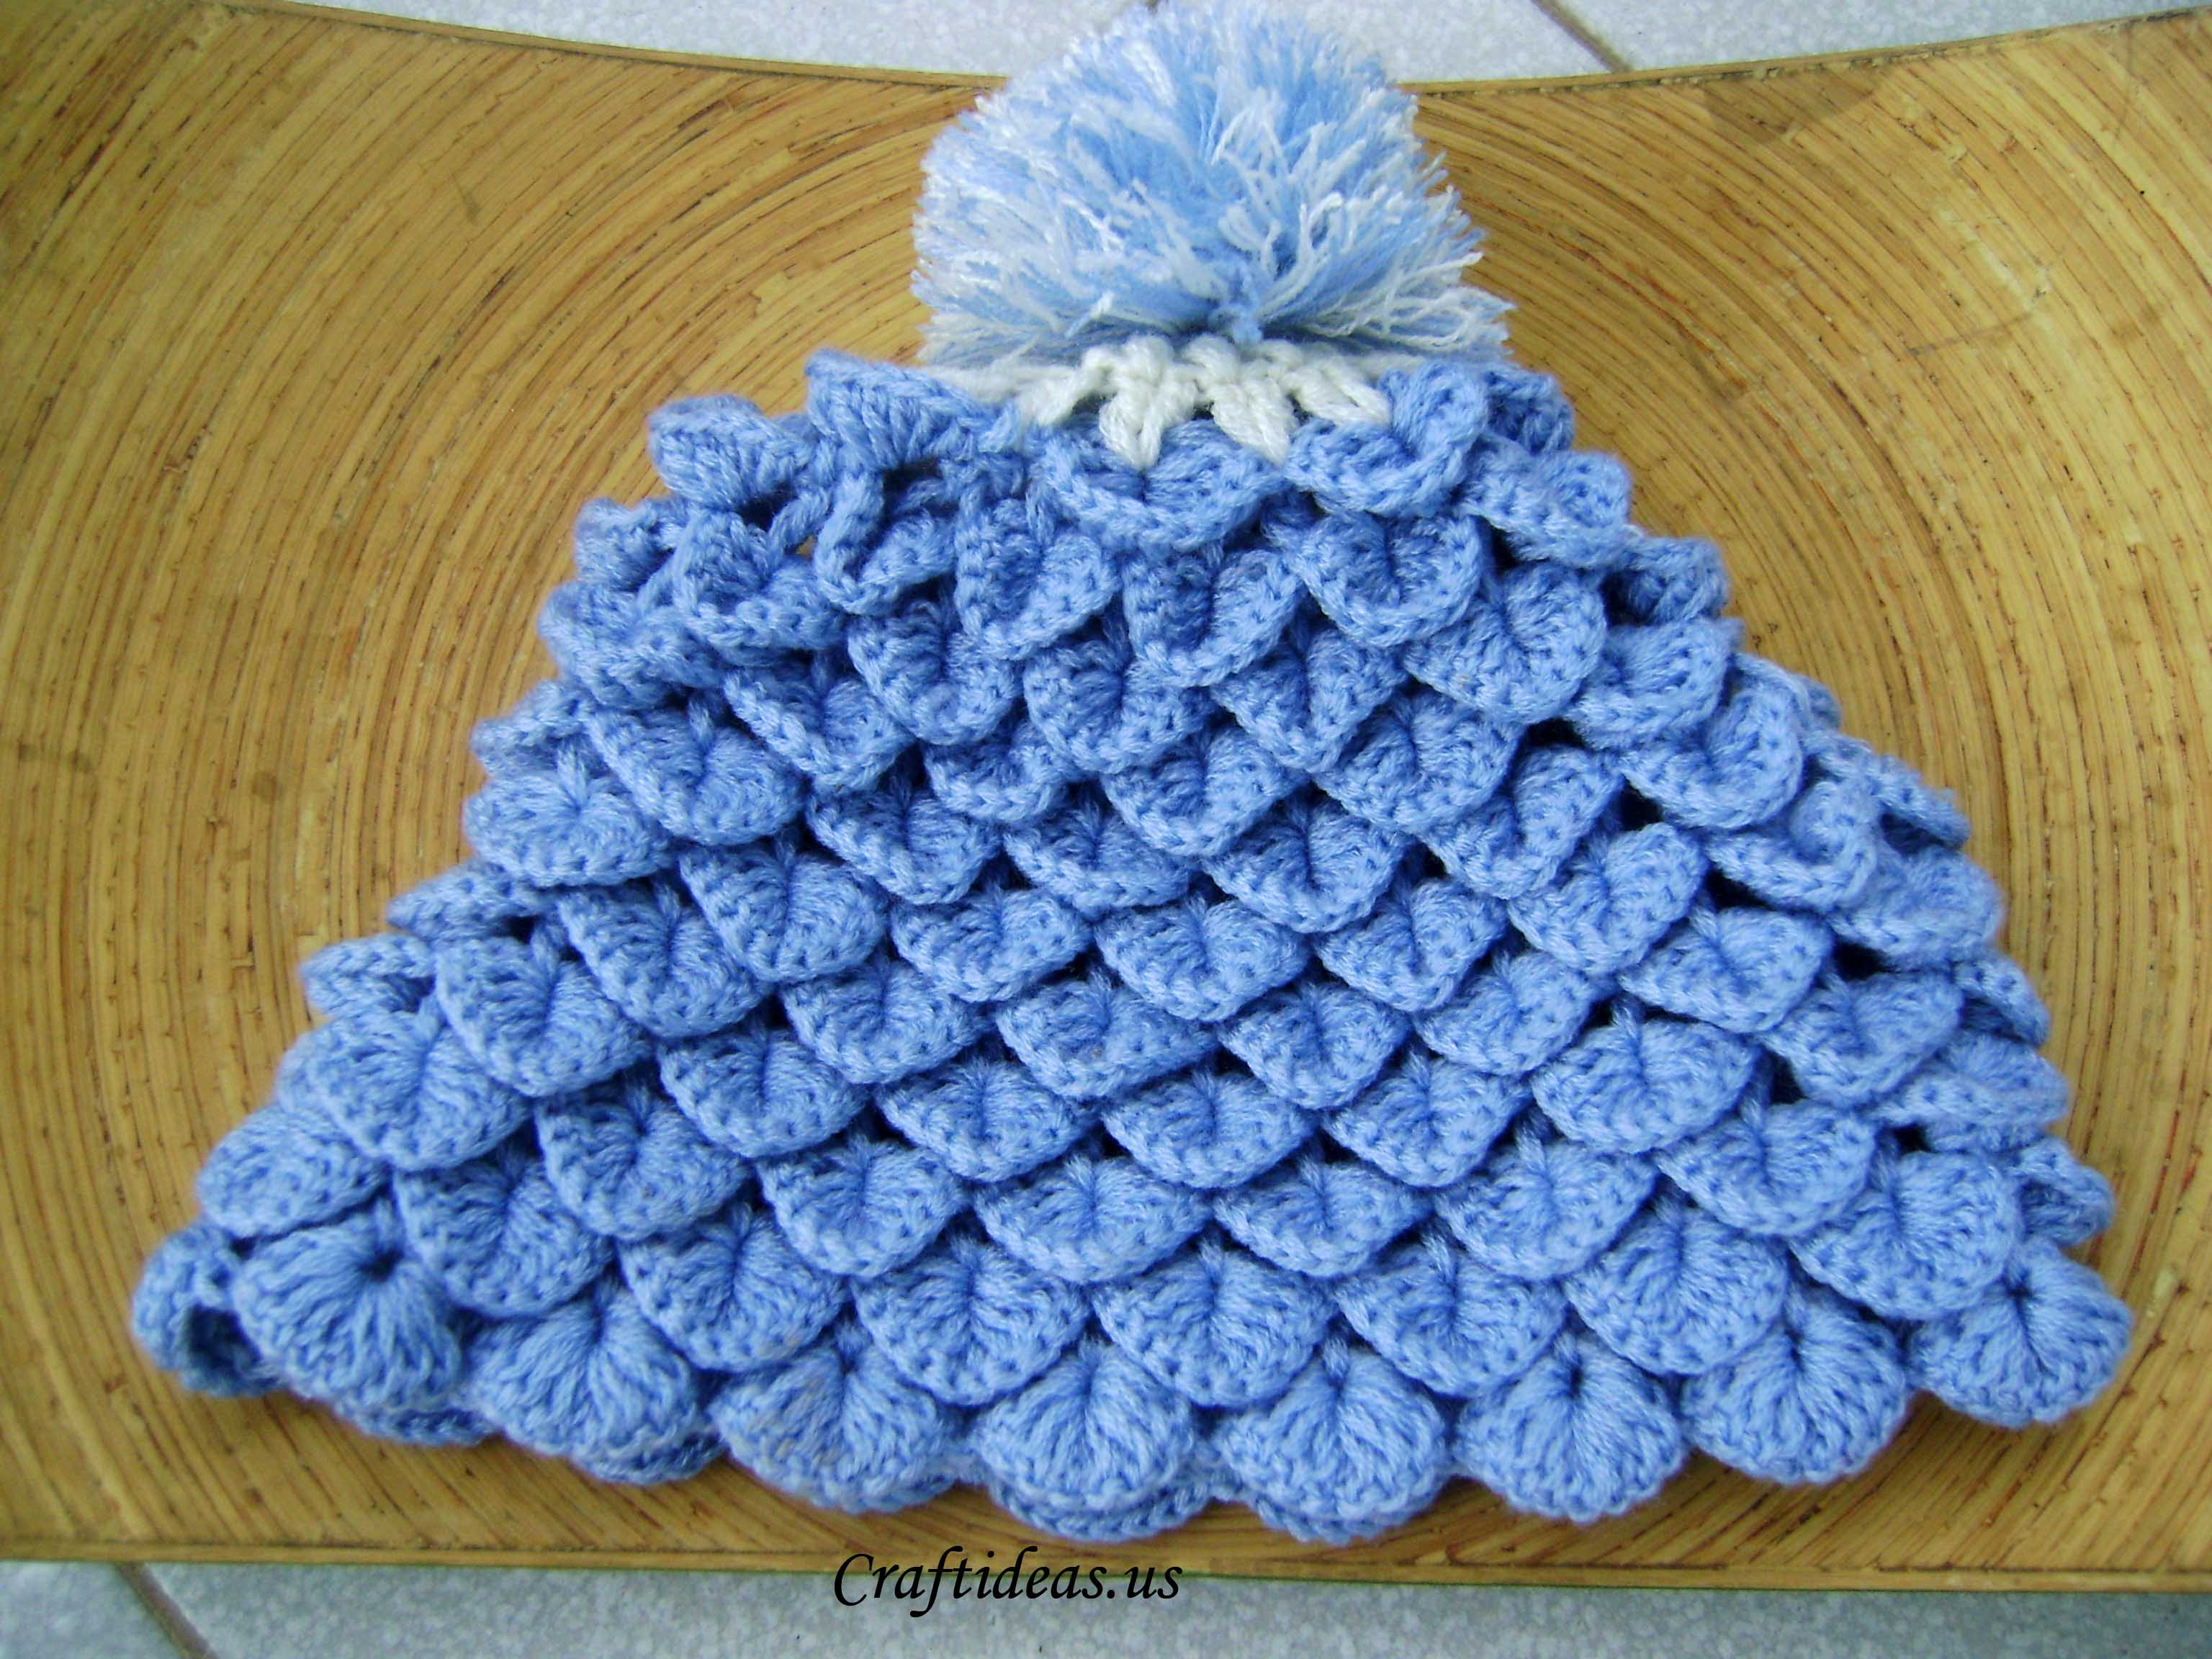 Crochet Craft Projects : Crochet hat for kids: crochet crocodile hat - Craft Ideas